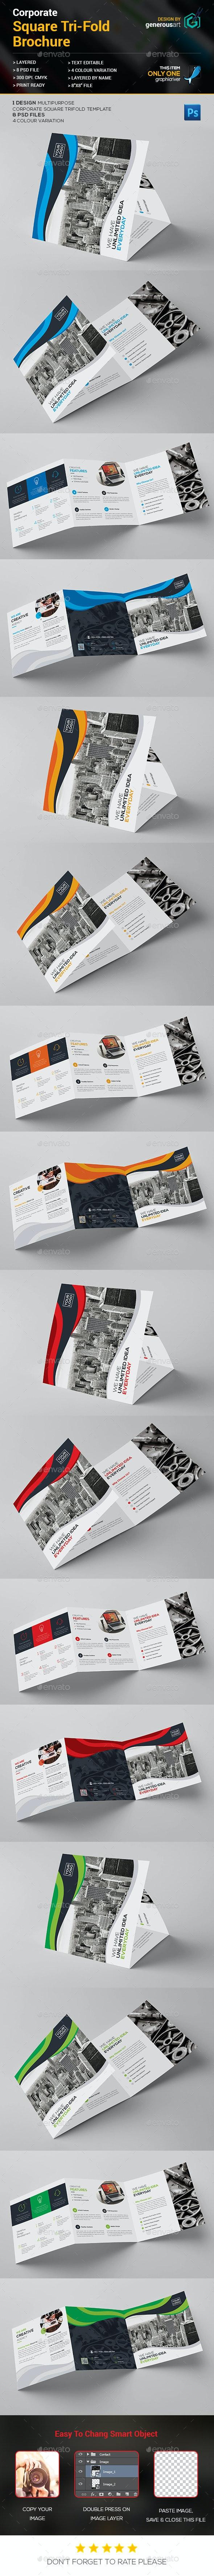 Square Tri-Fold Brochure – Corporate - Corporate Brochures